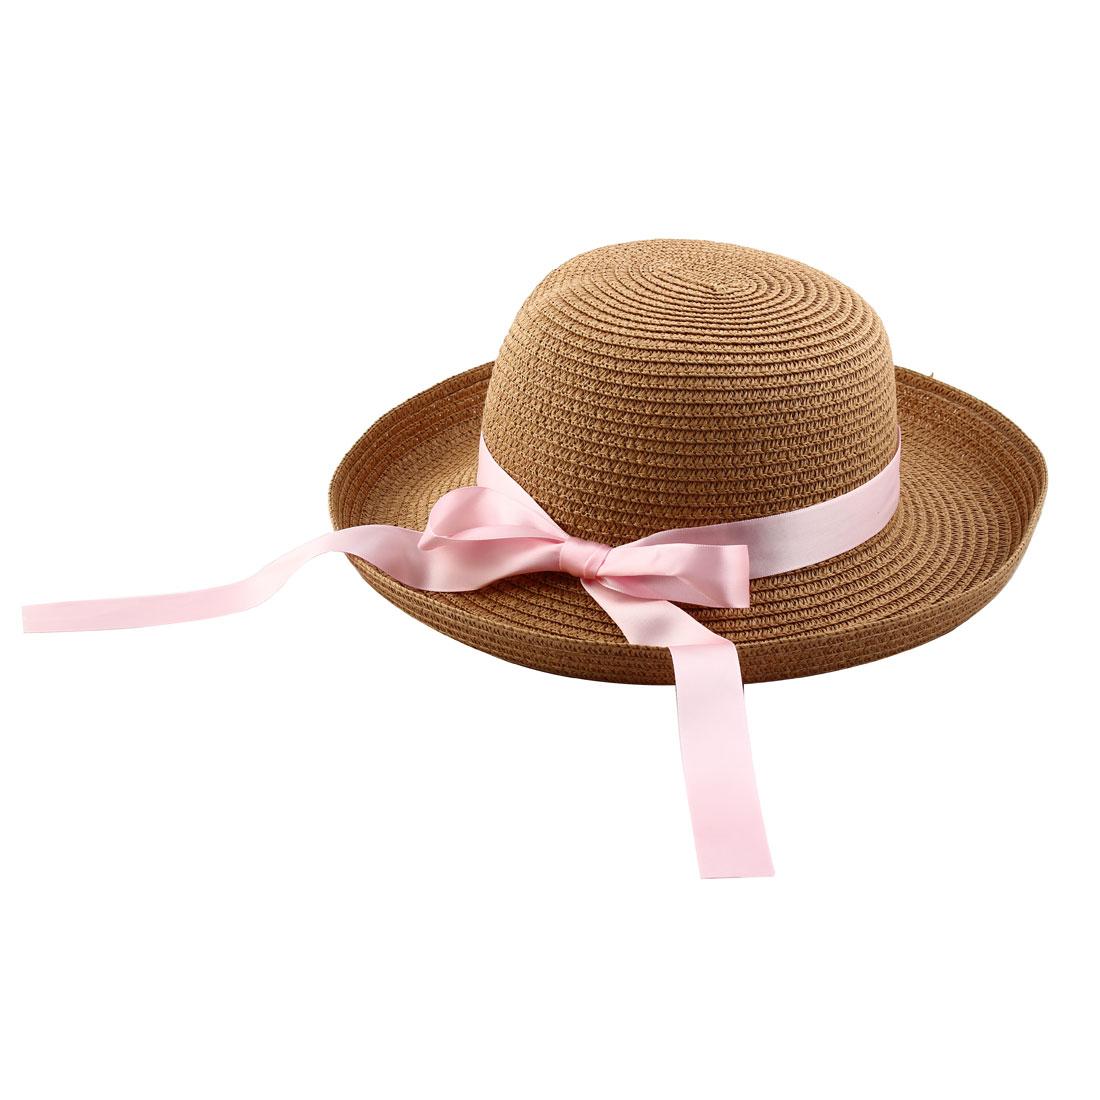 c0611828 Unique Bargains Lady Straw Braid Bowknot Decor Curling Brim Summer Beach  Leisure Cap Sun Hat